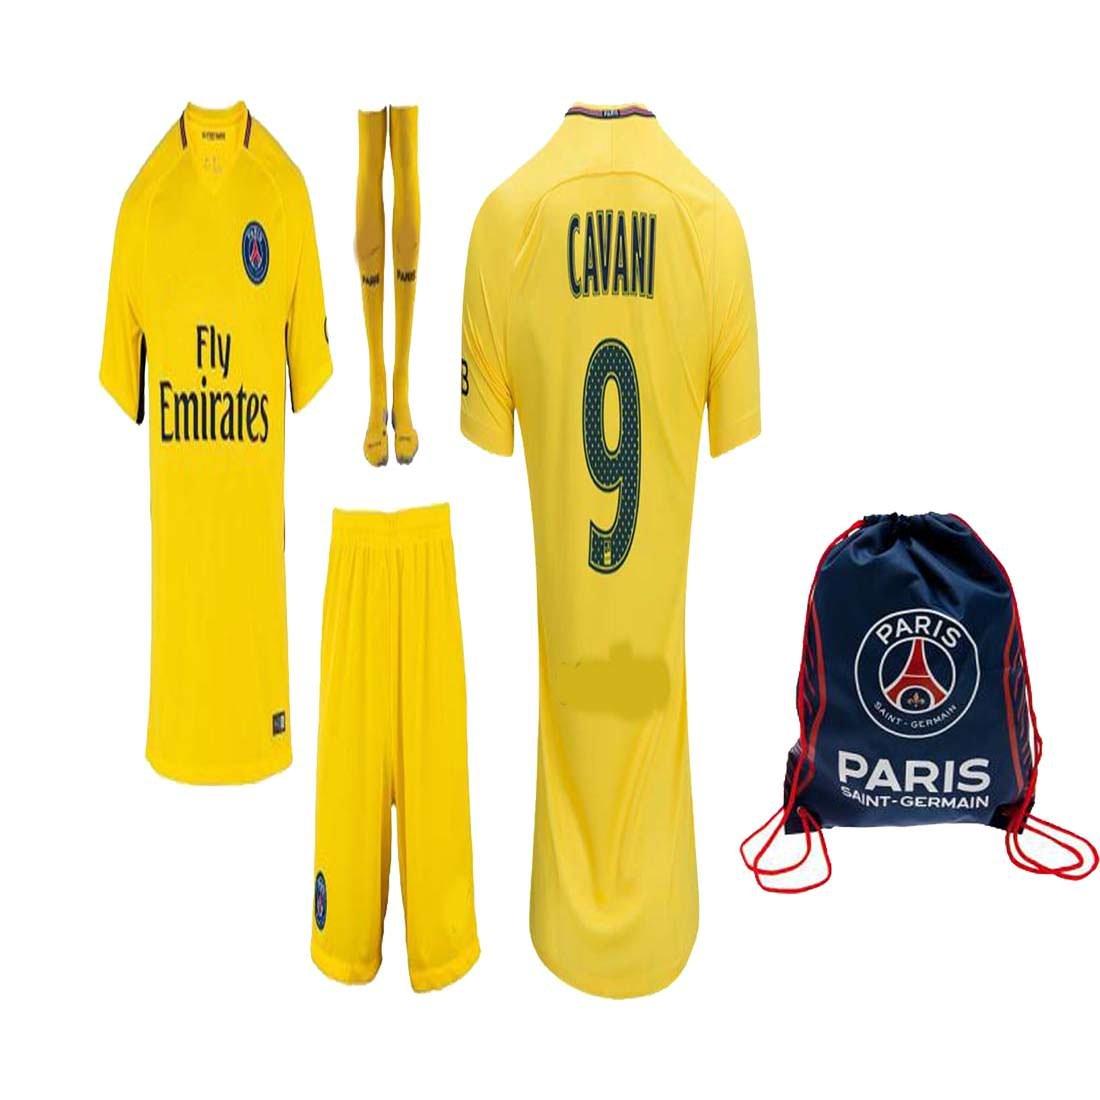 Kid Youth Paris Saint Germain Psg 2017 2018 17 18 Kaos Baju Tshirt Adidas 03 Replica Home Away Jersey Neymar Jr Cavani Di Maria Kit Short Socks Soccer Bag